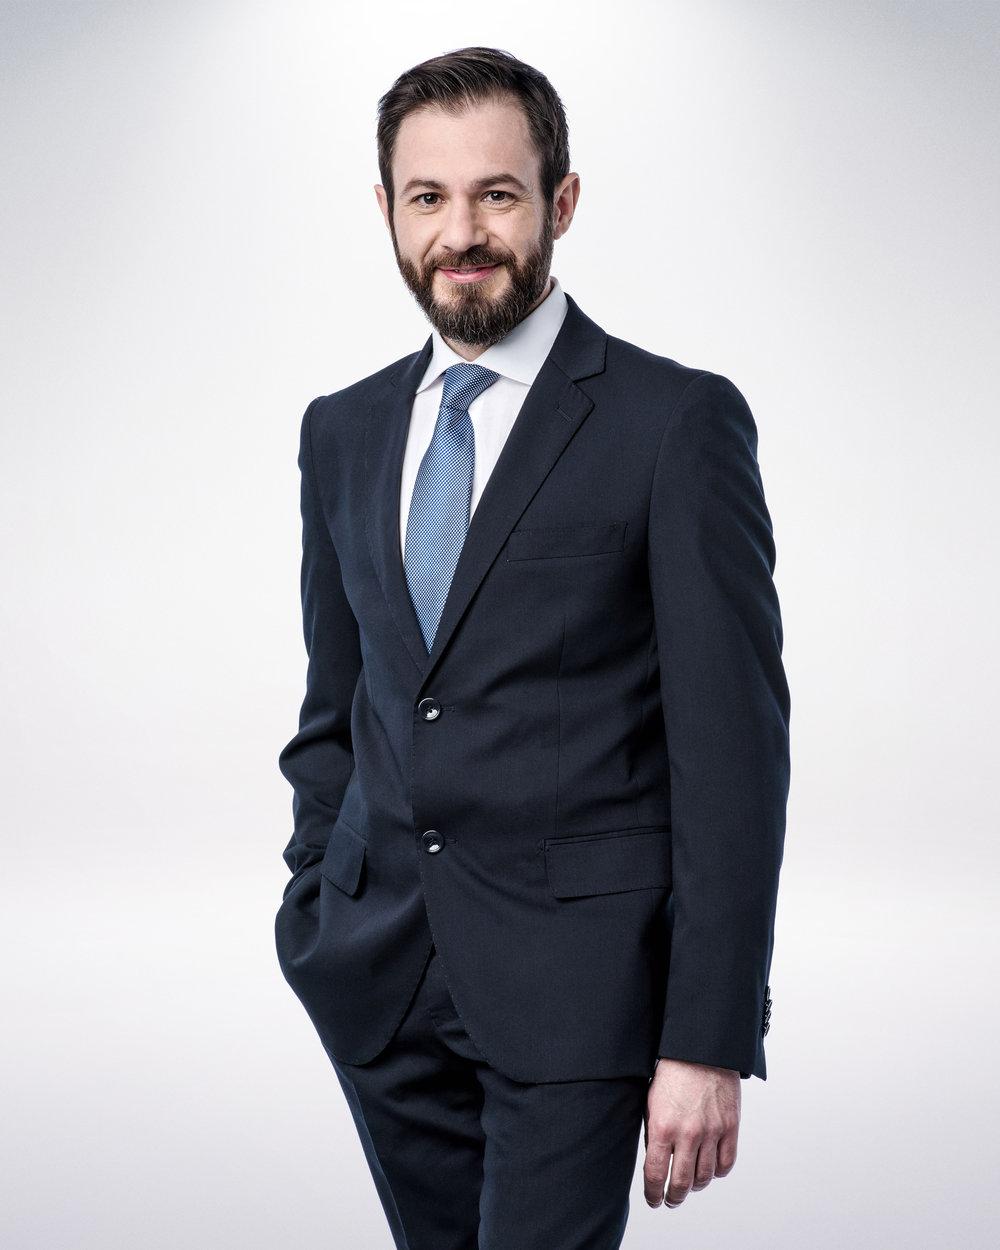 Renzo Di Gregorio - Athena Founding partner and Director